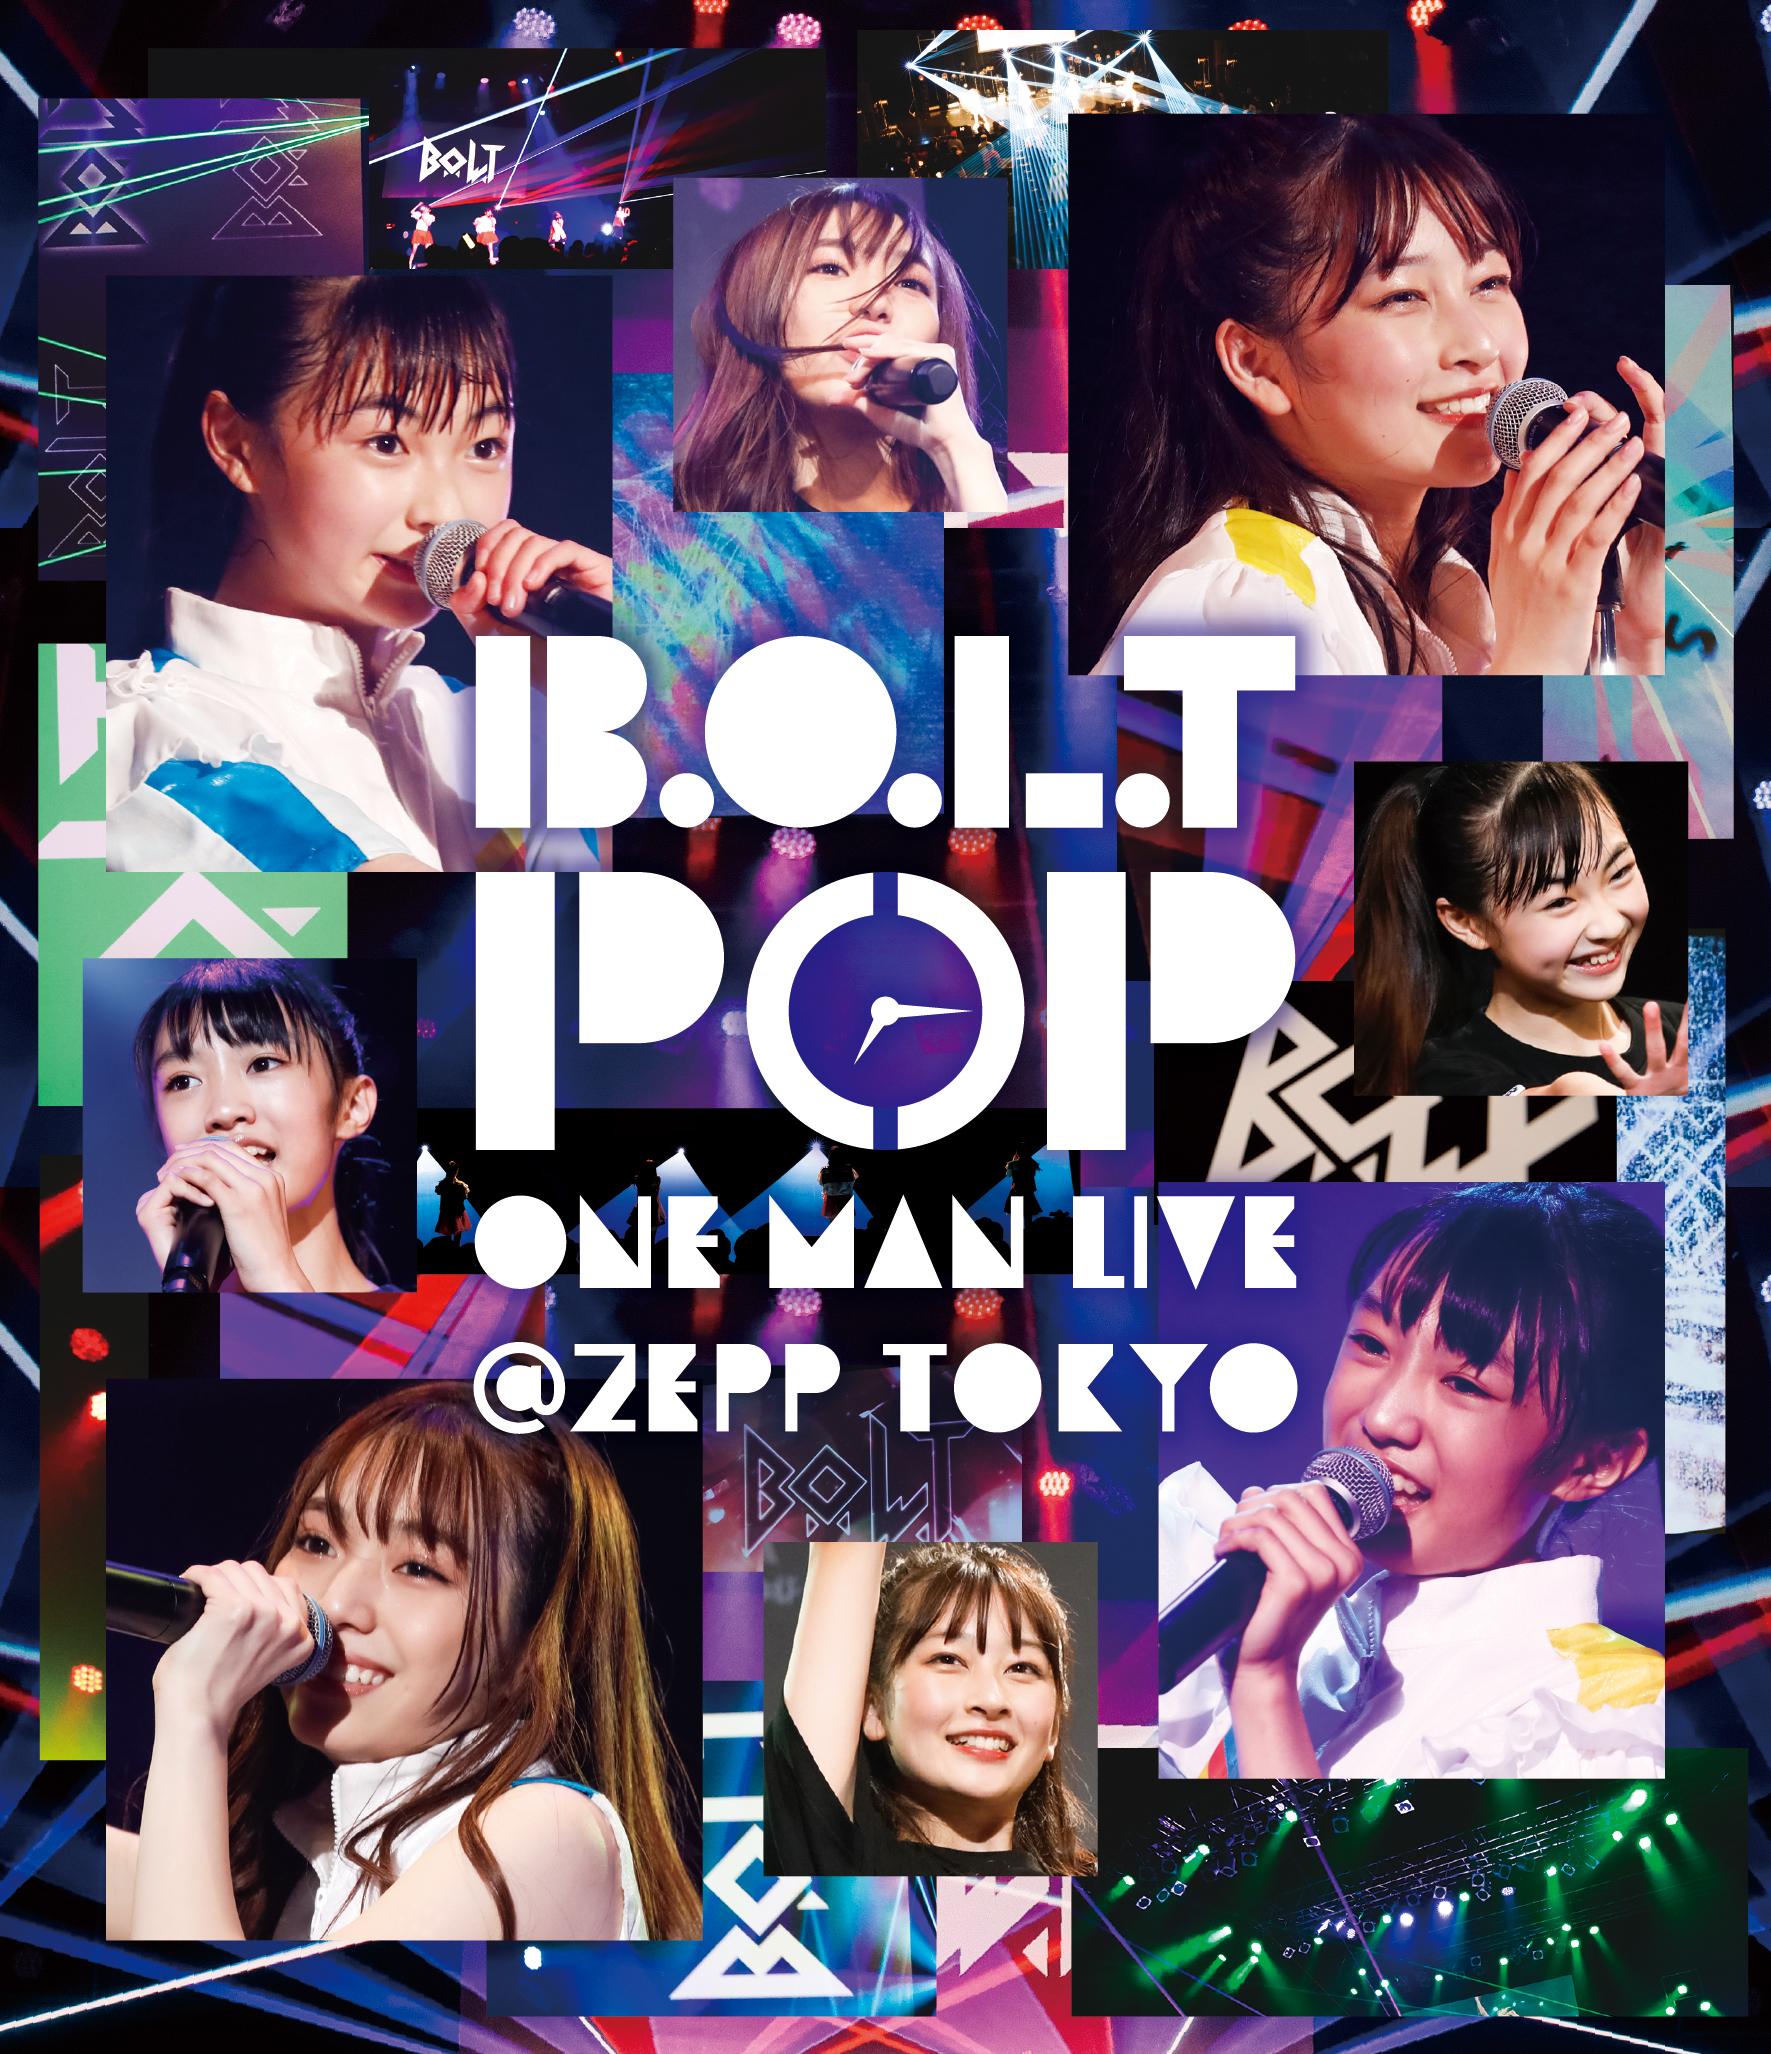 『B.O.L.T「POP」ONE MAN LIVE@Zepp Tokyo』Blu-rayジャケット